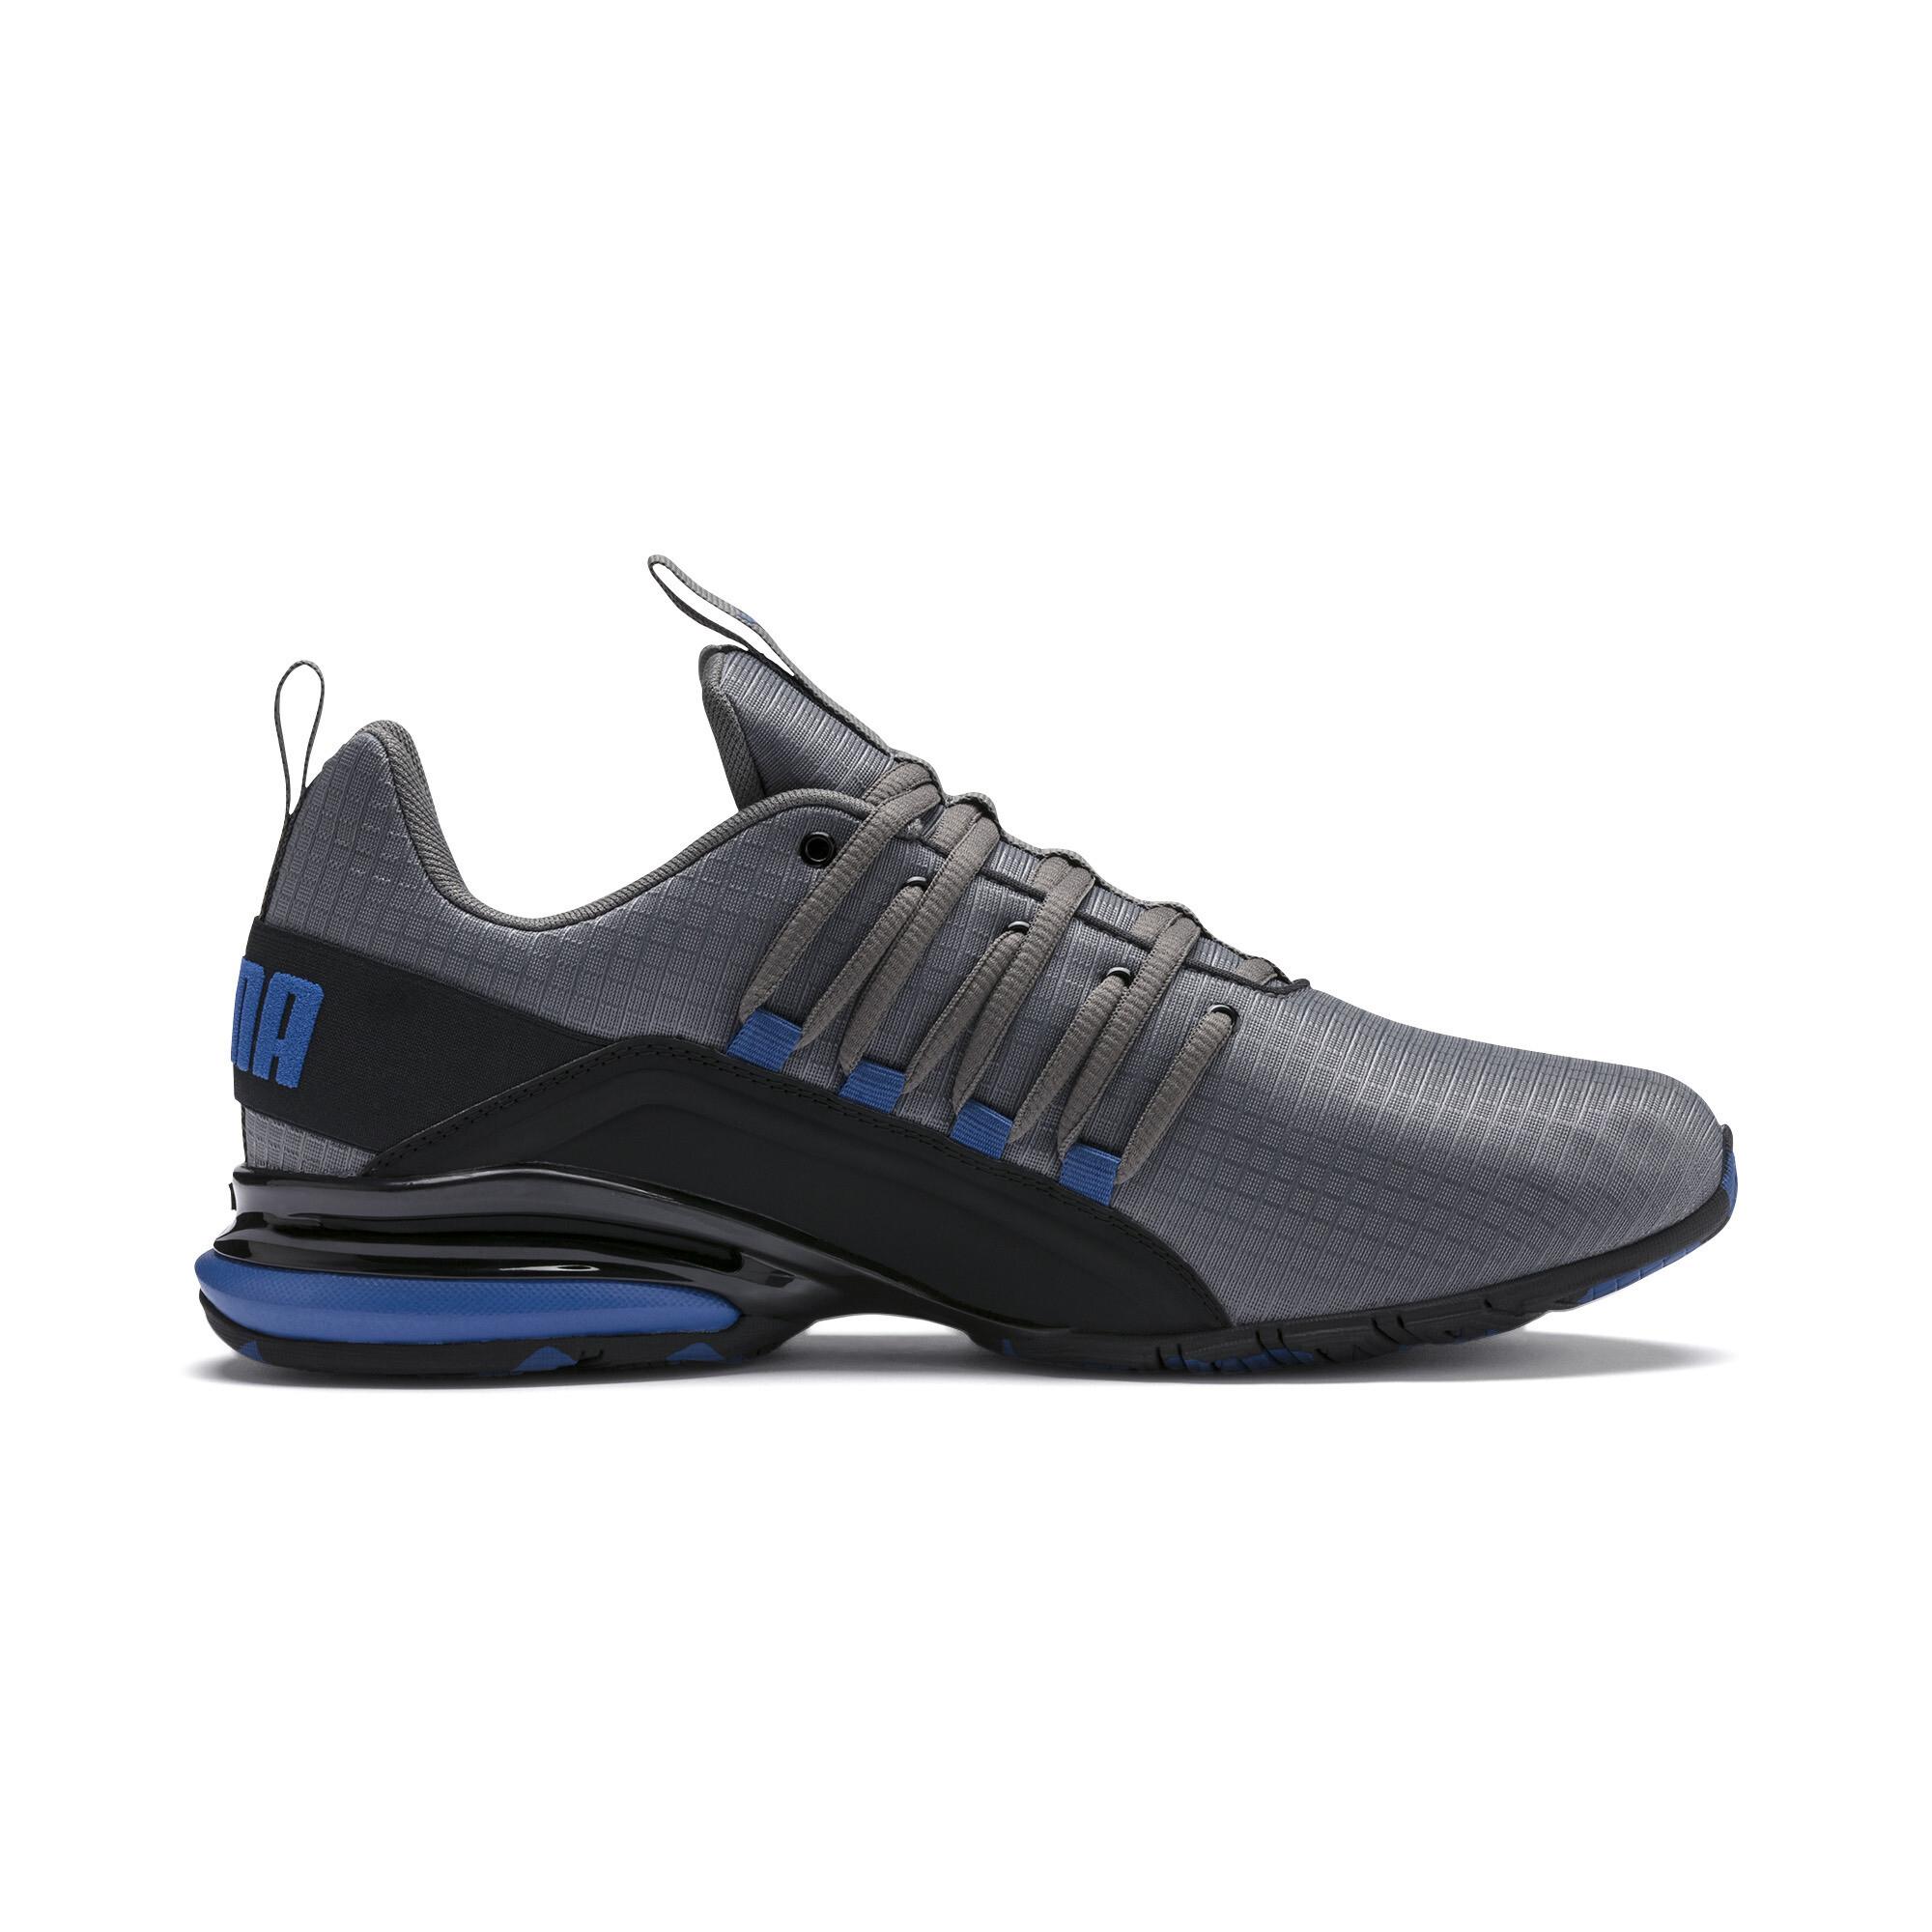 PUMA-Men-039-s-Axelion-Rip-Training-Shoes thumbnail 21